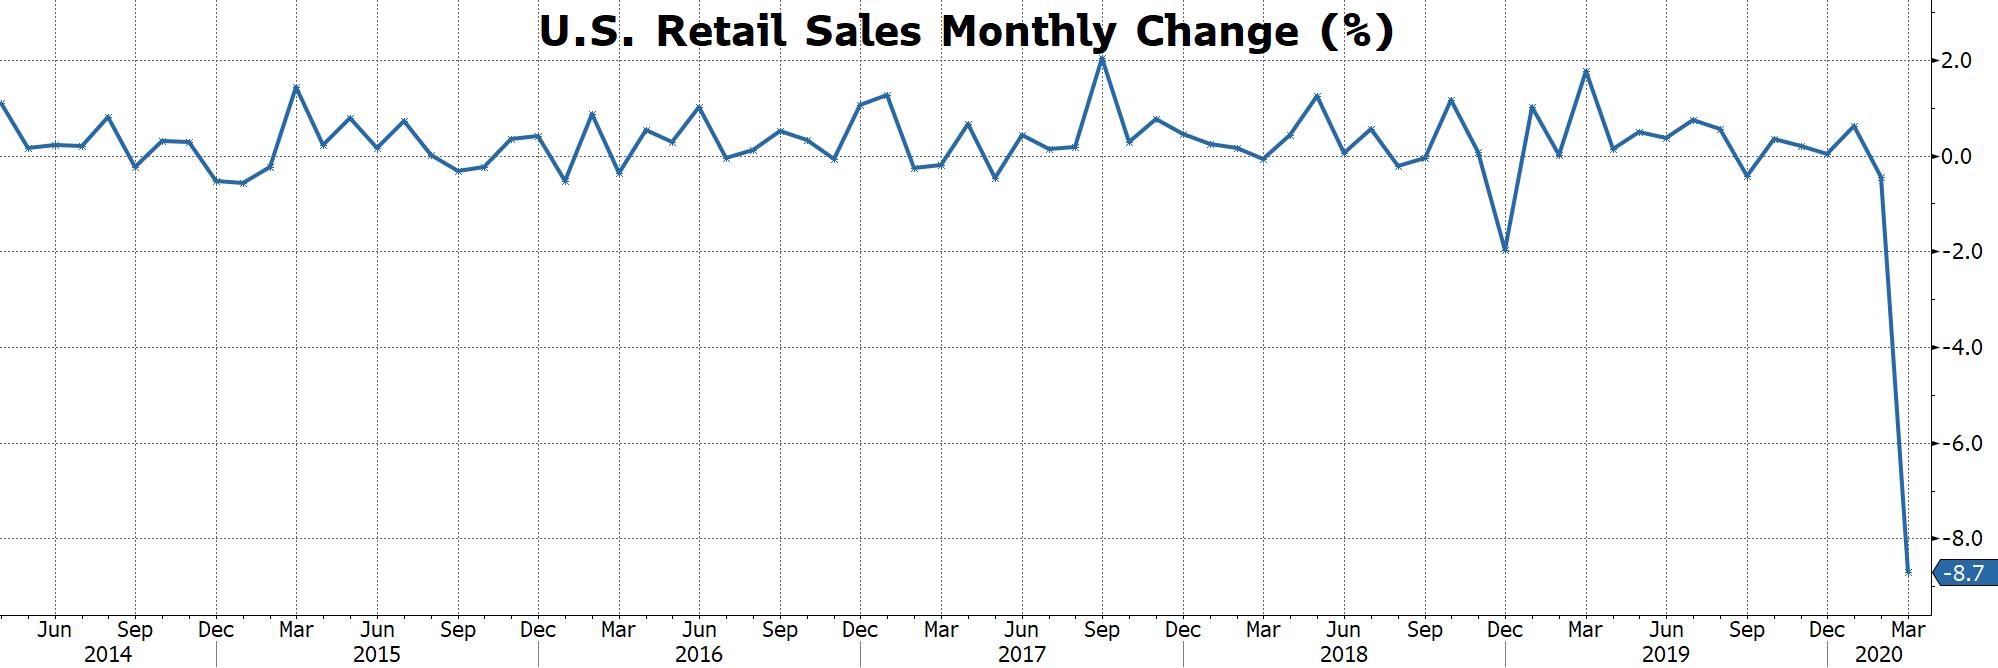 Graph: U.S. Retail Sales Monthly Change (%)